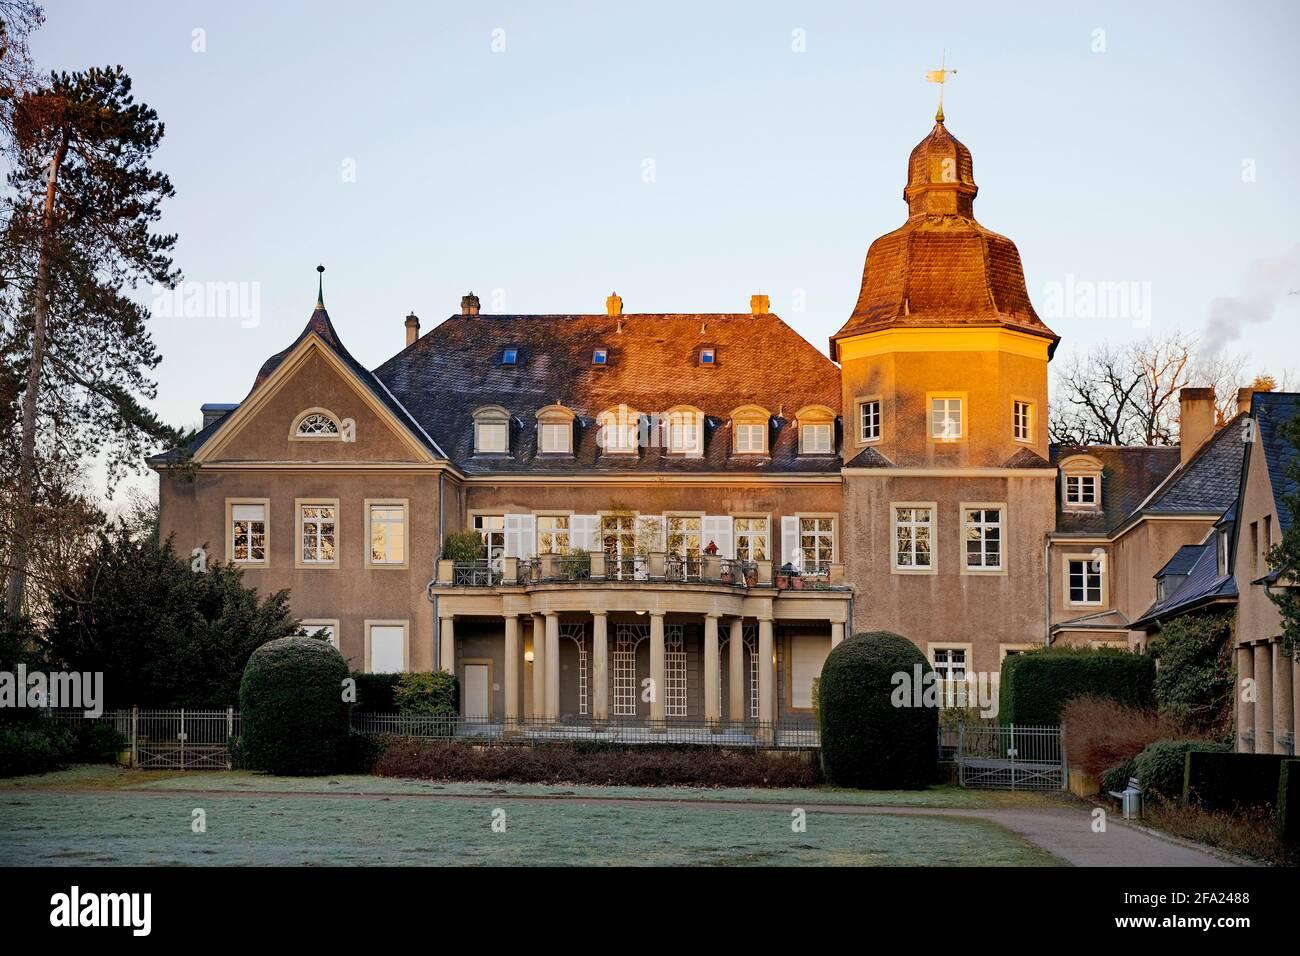 Garath Palace at sunrise, Germany, North Rhine-Westphalia, Lower Rhine, Dusseldorf Stock Photo